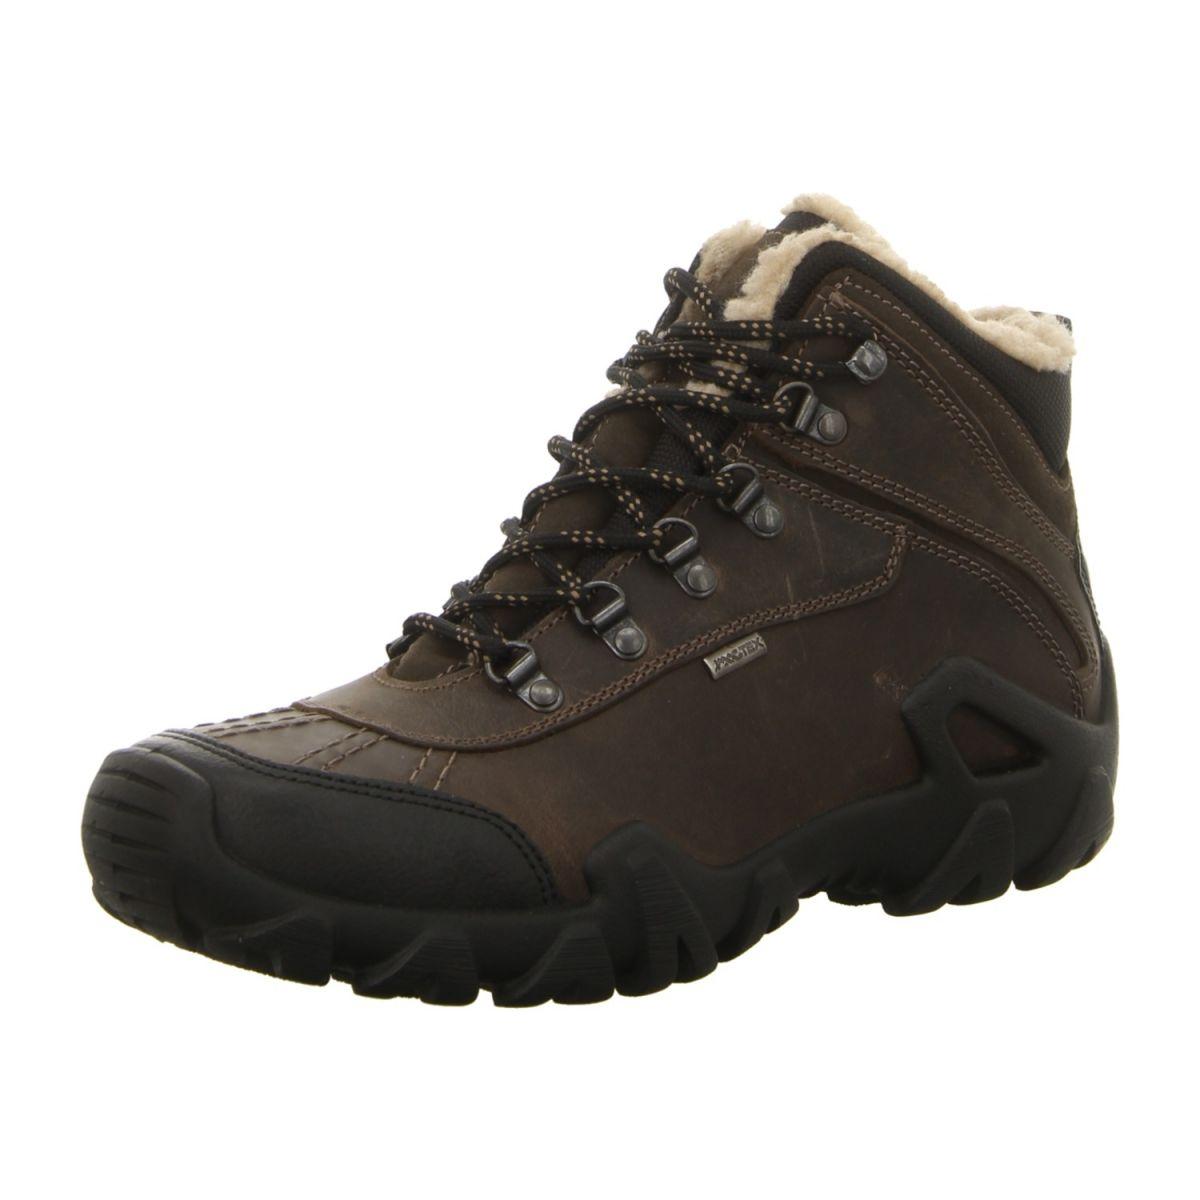 Neu Imac Stiefeletten 61816 3473 011 Dove Mens Fashion Boots Hiking Boots